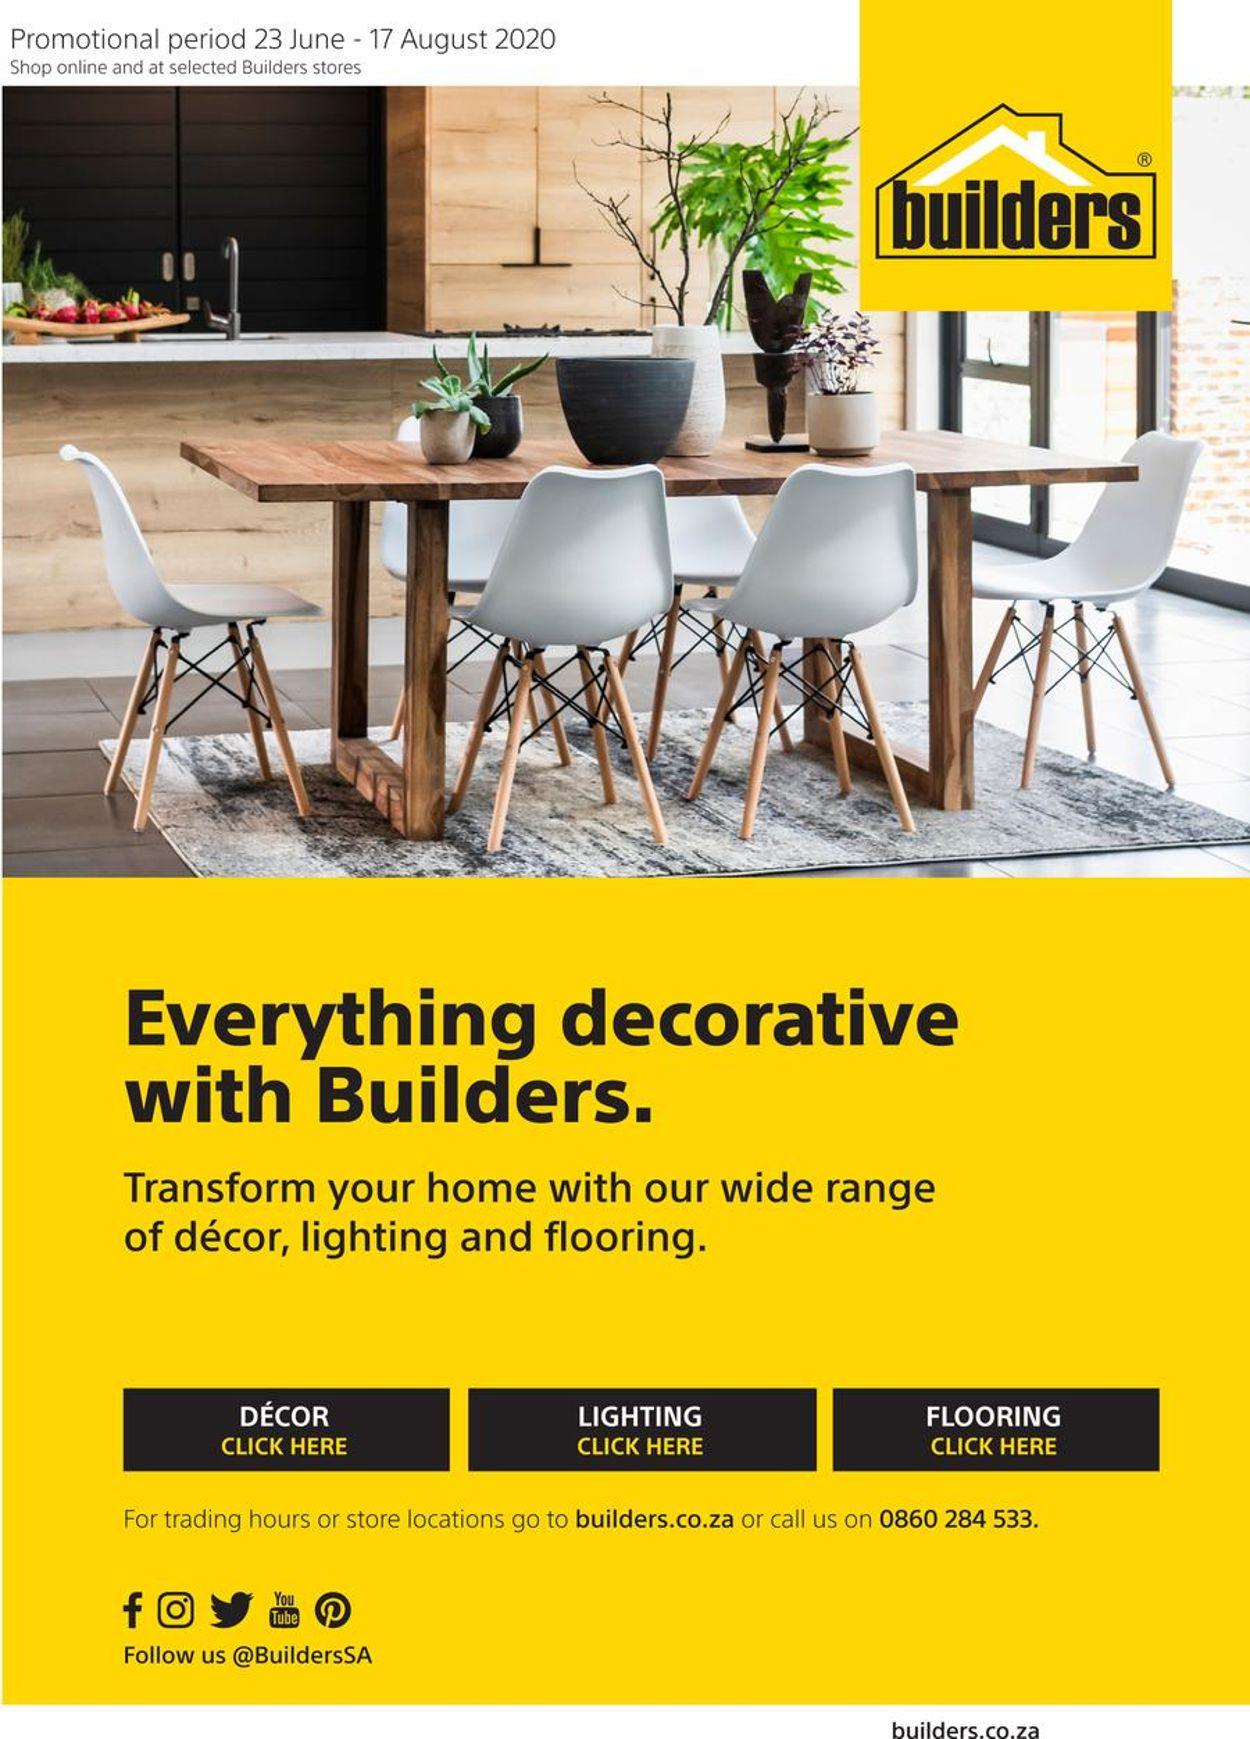 Builders Warehouse Catalogue - 2020/06/23-2020/08/17